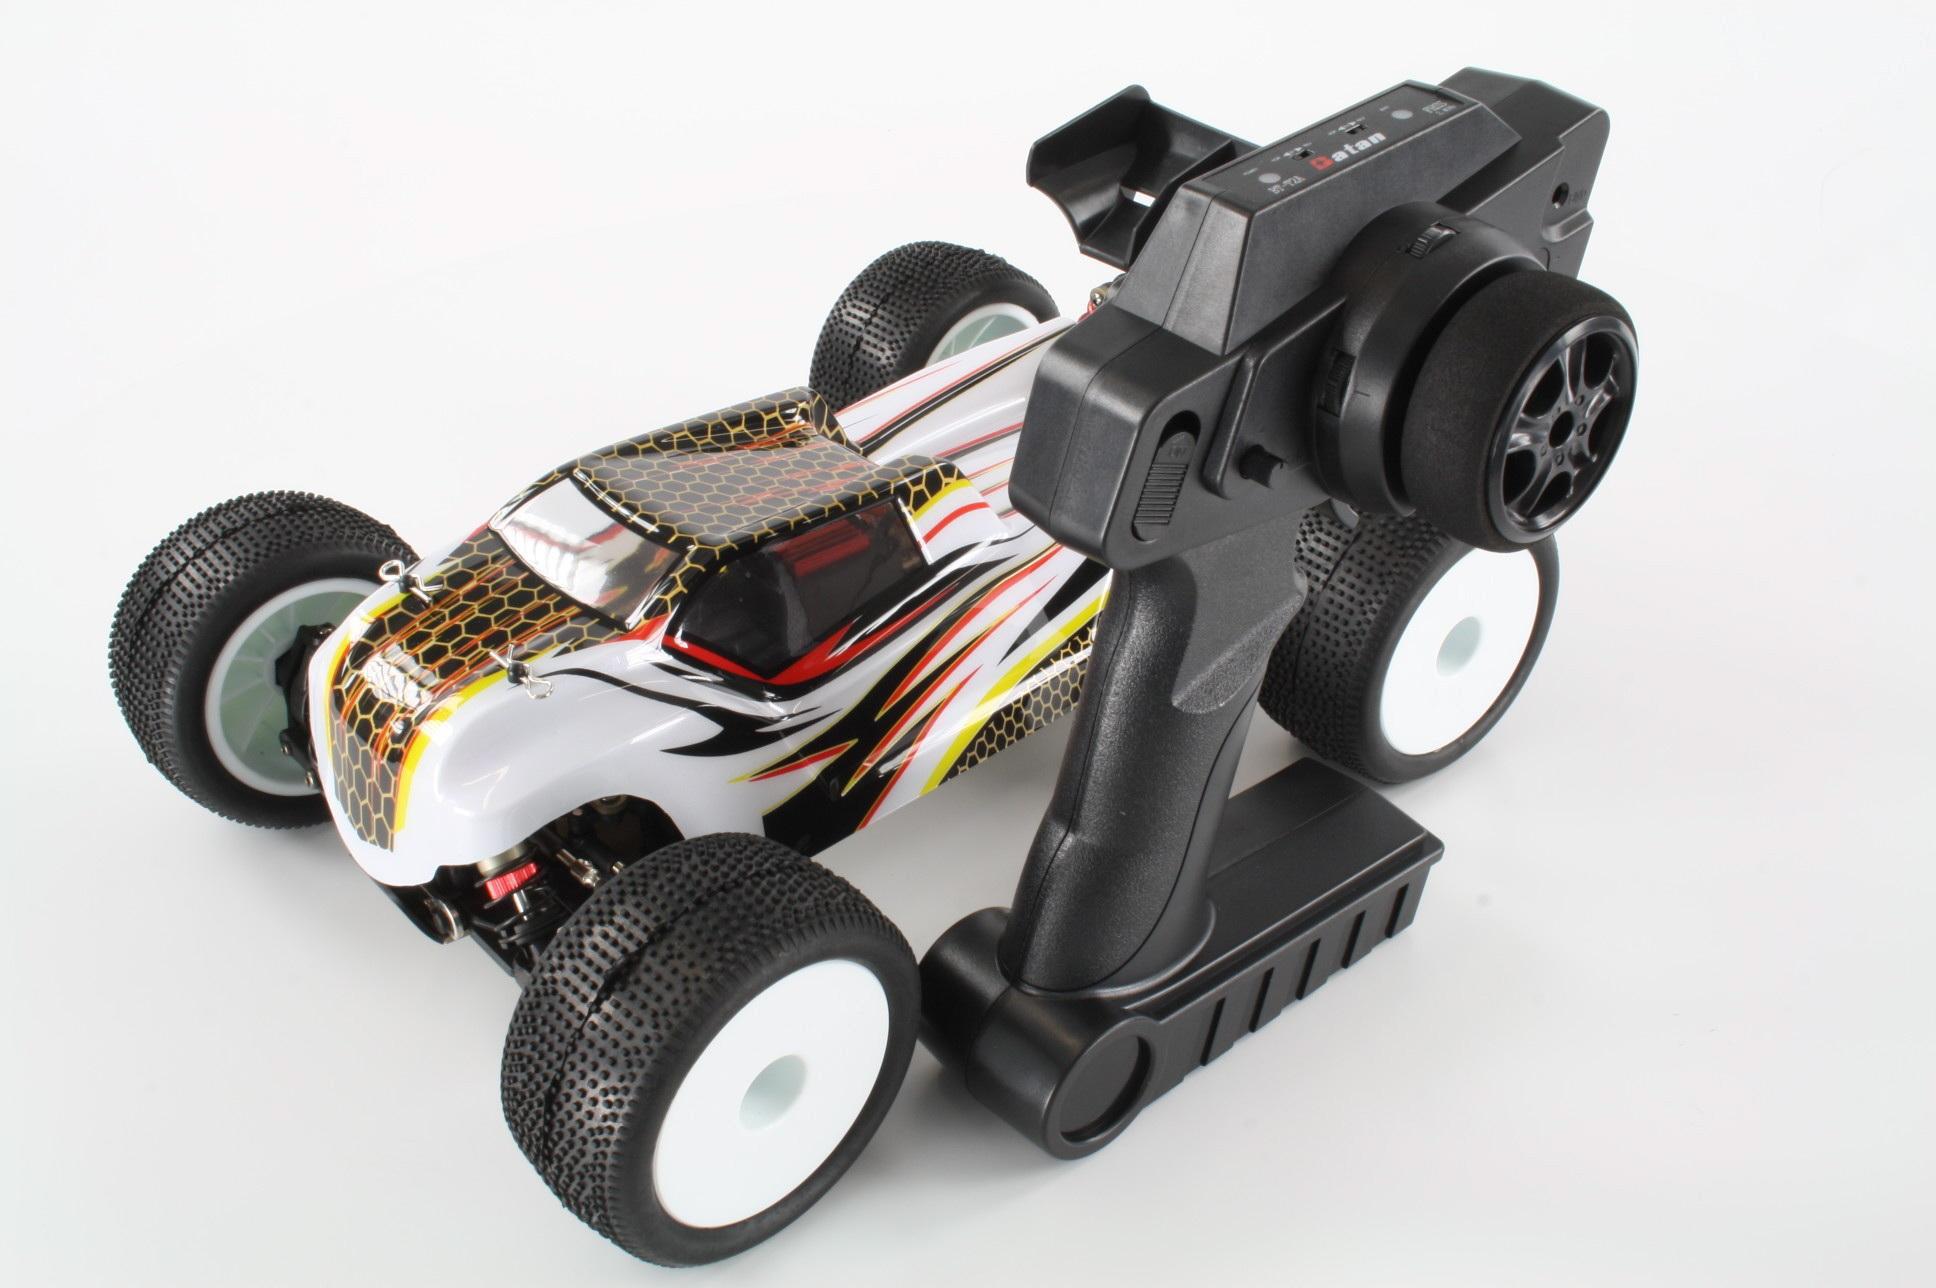 LC Racing Truggy 1:14